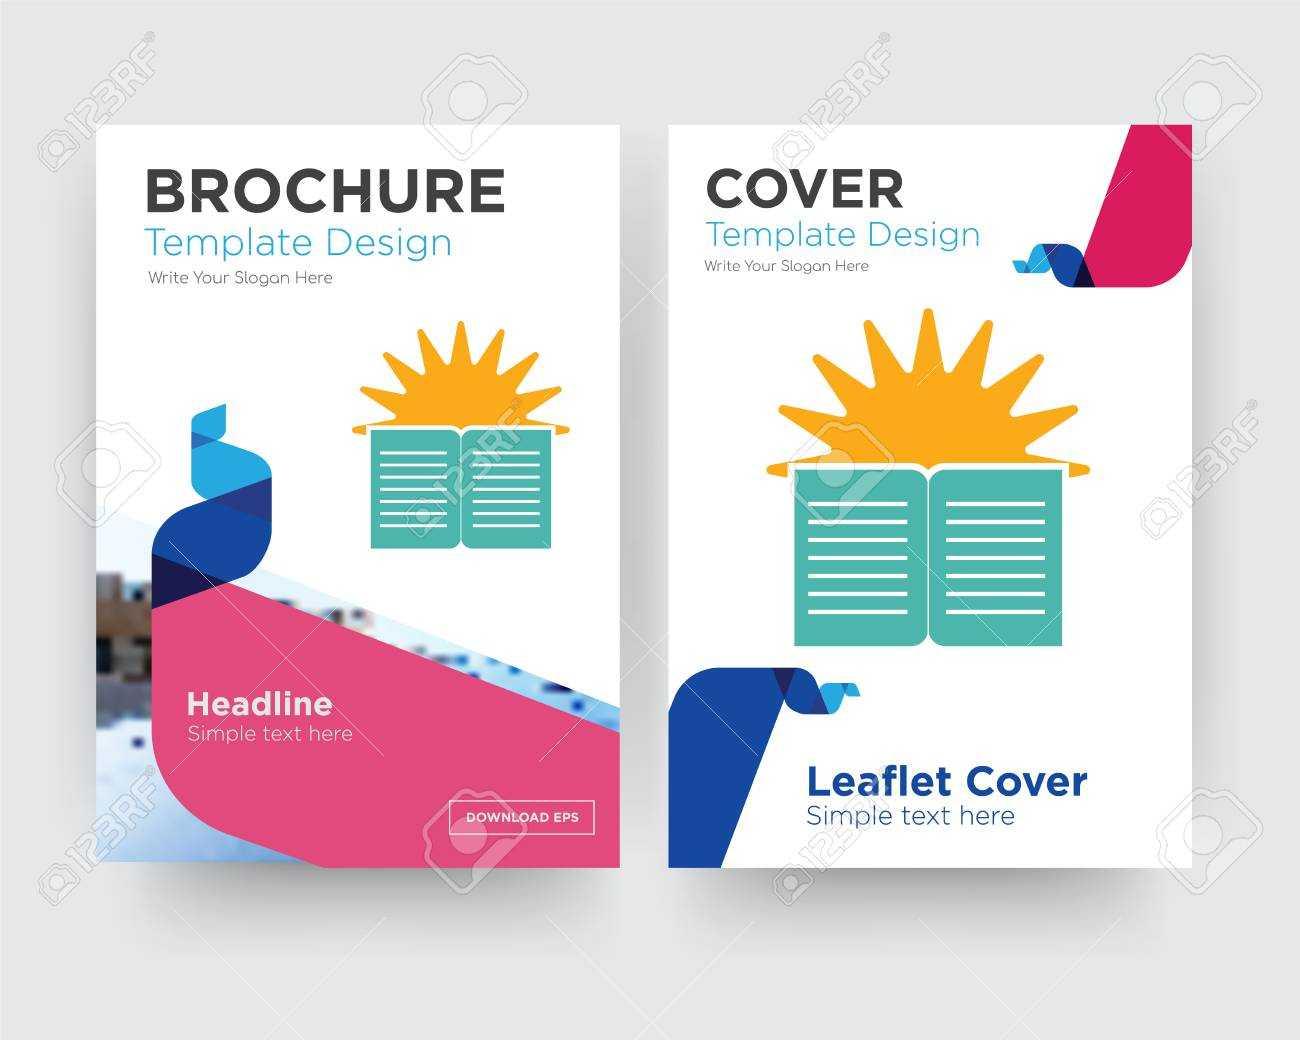 Sunday School Brochure Flyer Design Template With Abstract Photo.. Inside School Brochure Design Templates